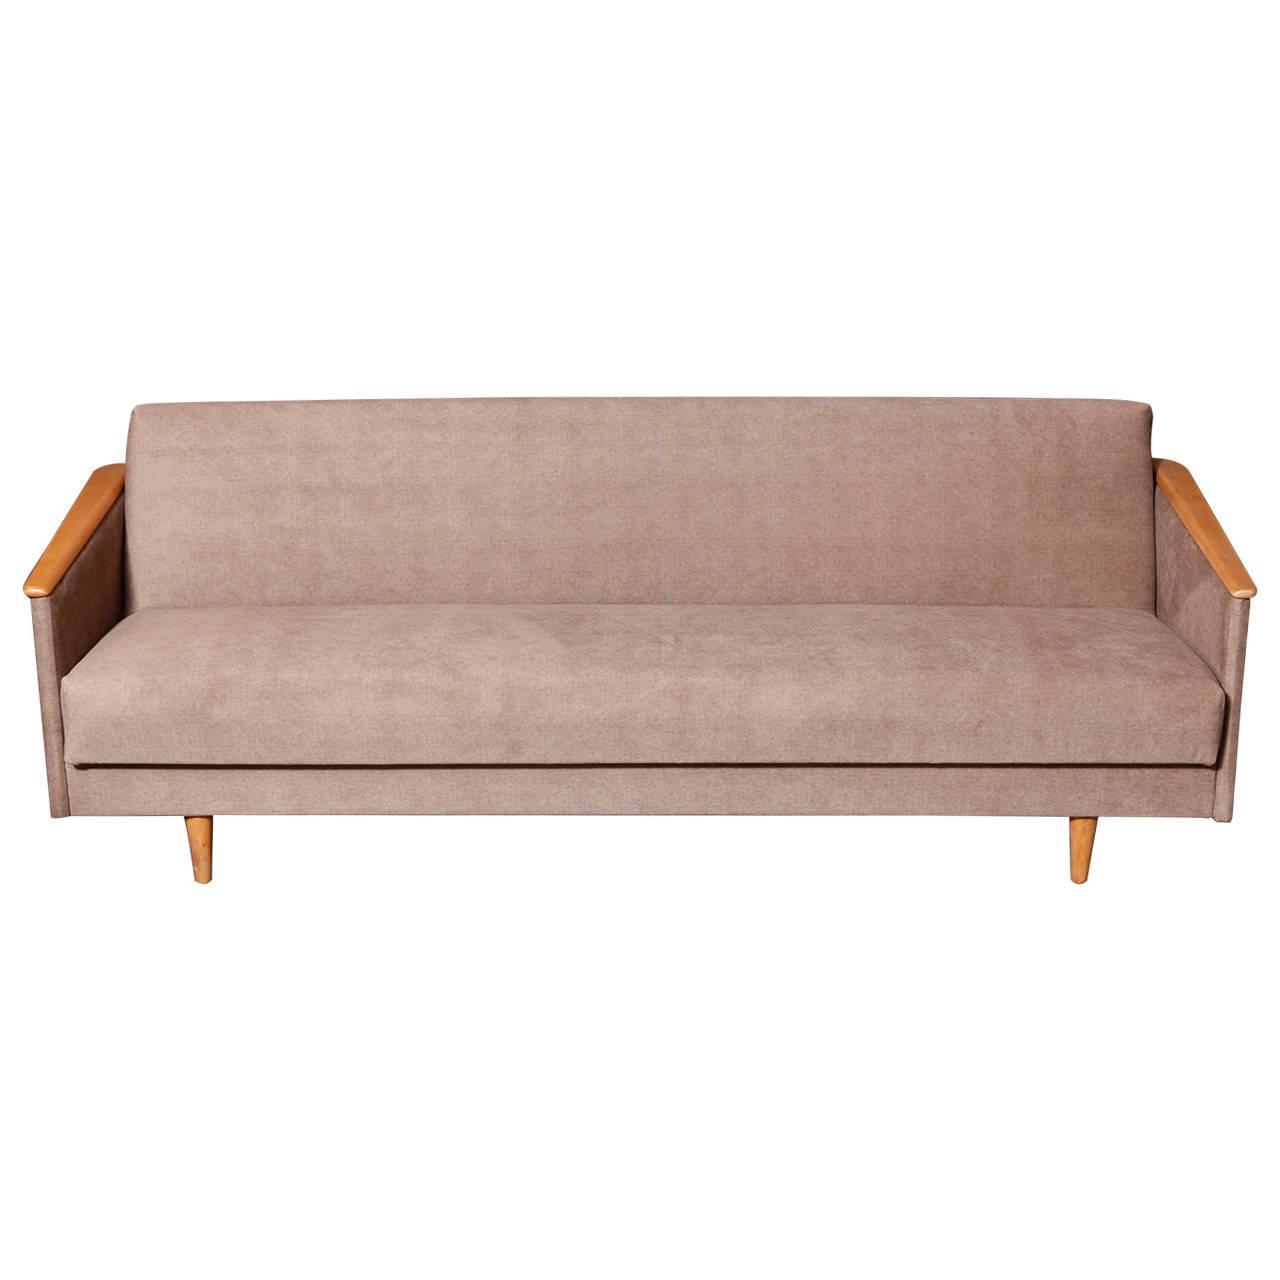 Mid Century Modern 1960's Convertible Sofa Bed